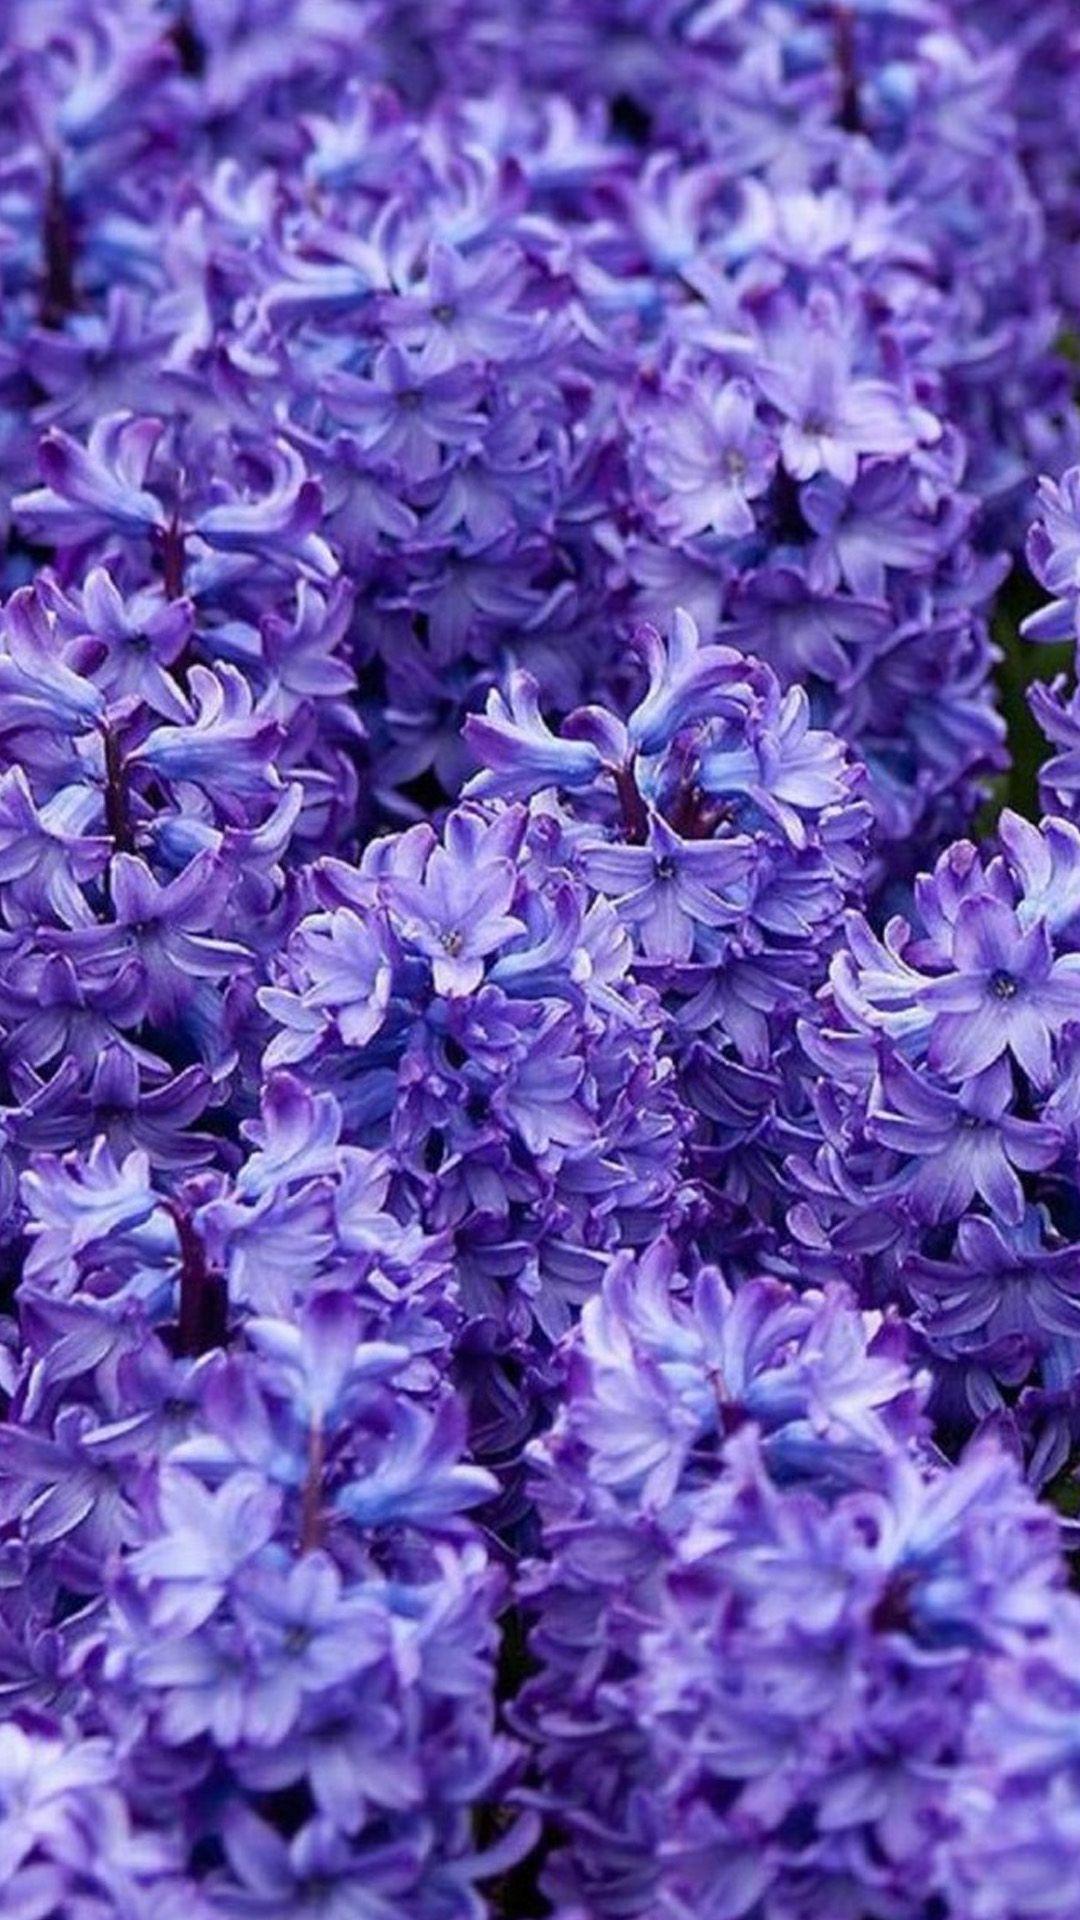 Purple Flower Wallpaper For Iphone Mywallpapers Site Purple Flowers Wallpaper Flower Iphone Wallpaper Purple Flowers